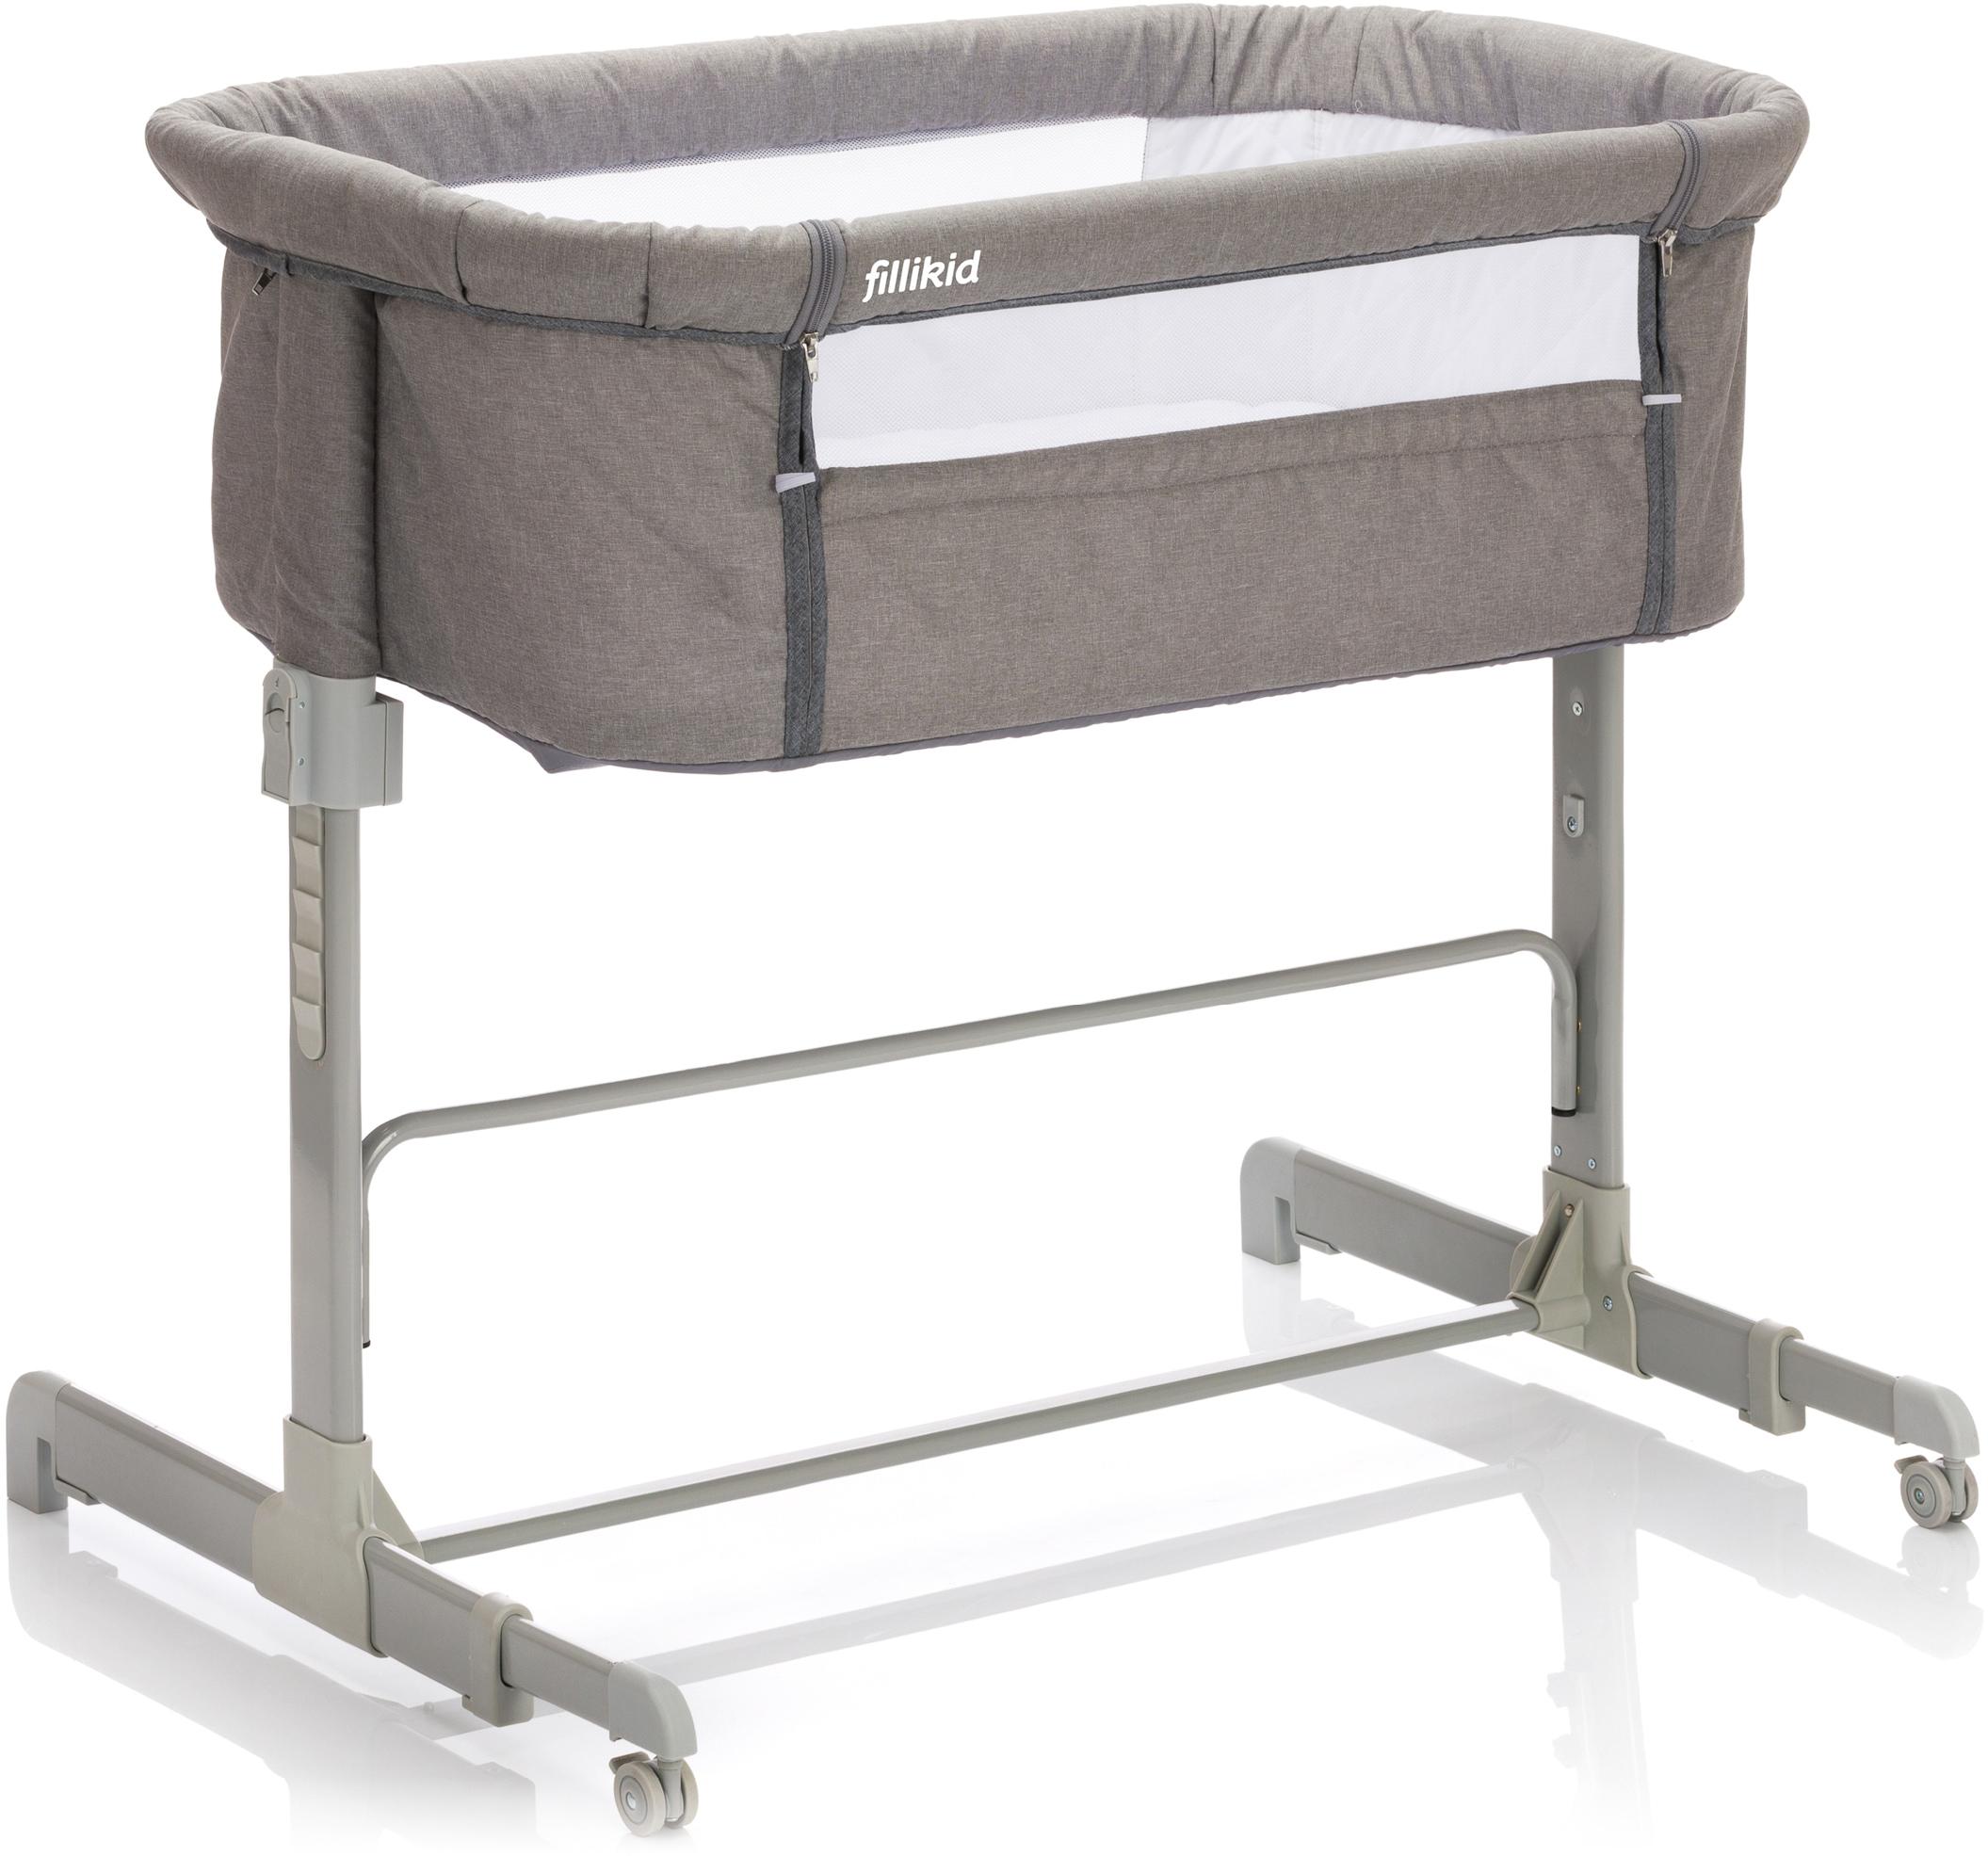 Fillikid Beistellbett Relax, grau melange Baby Beistellbetten Babybetten Babymöbel